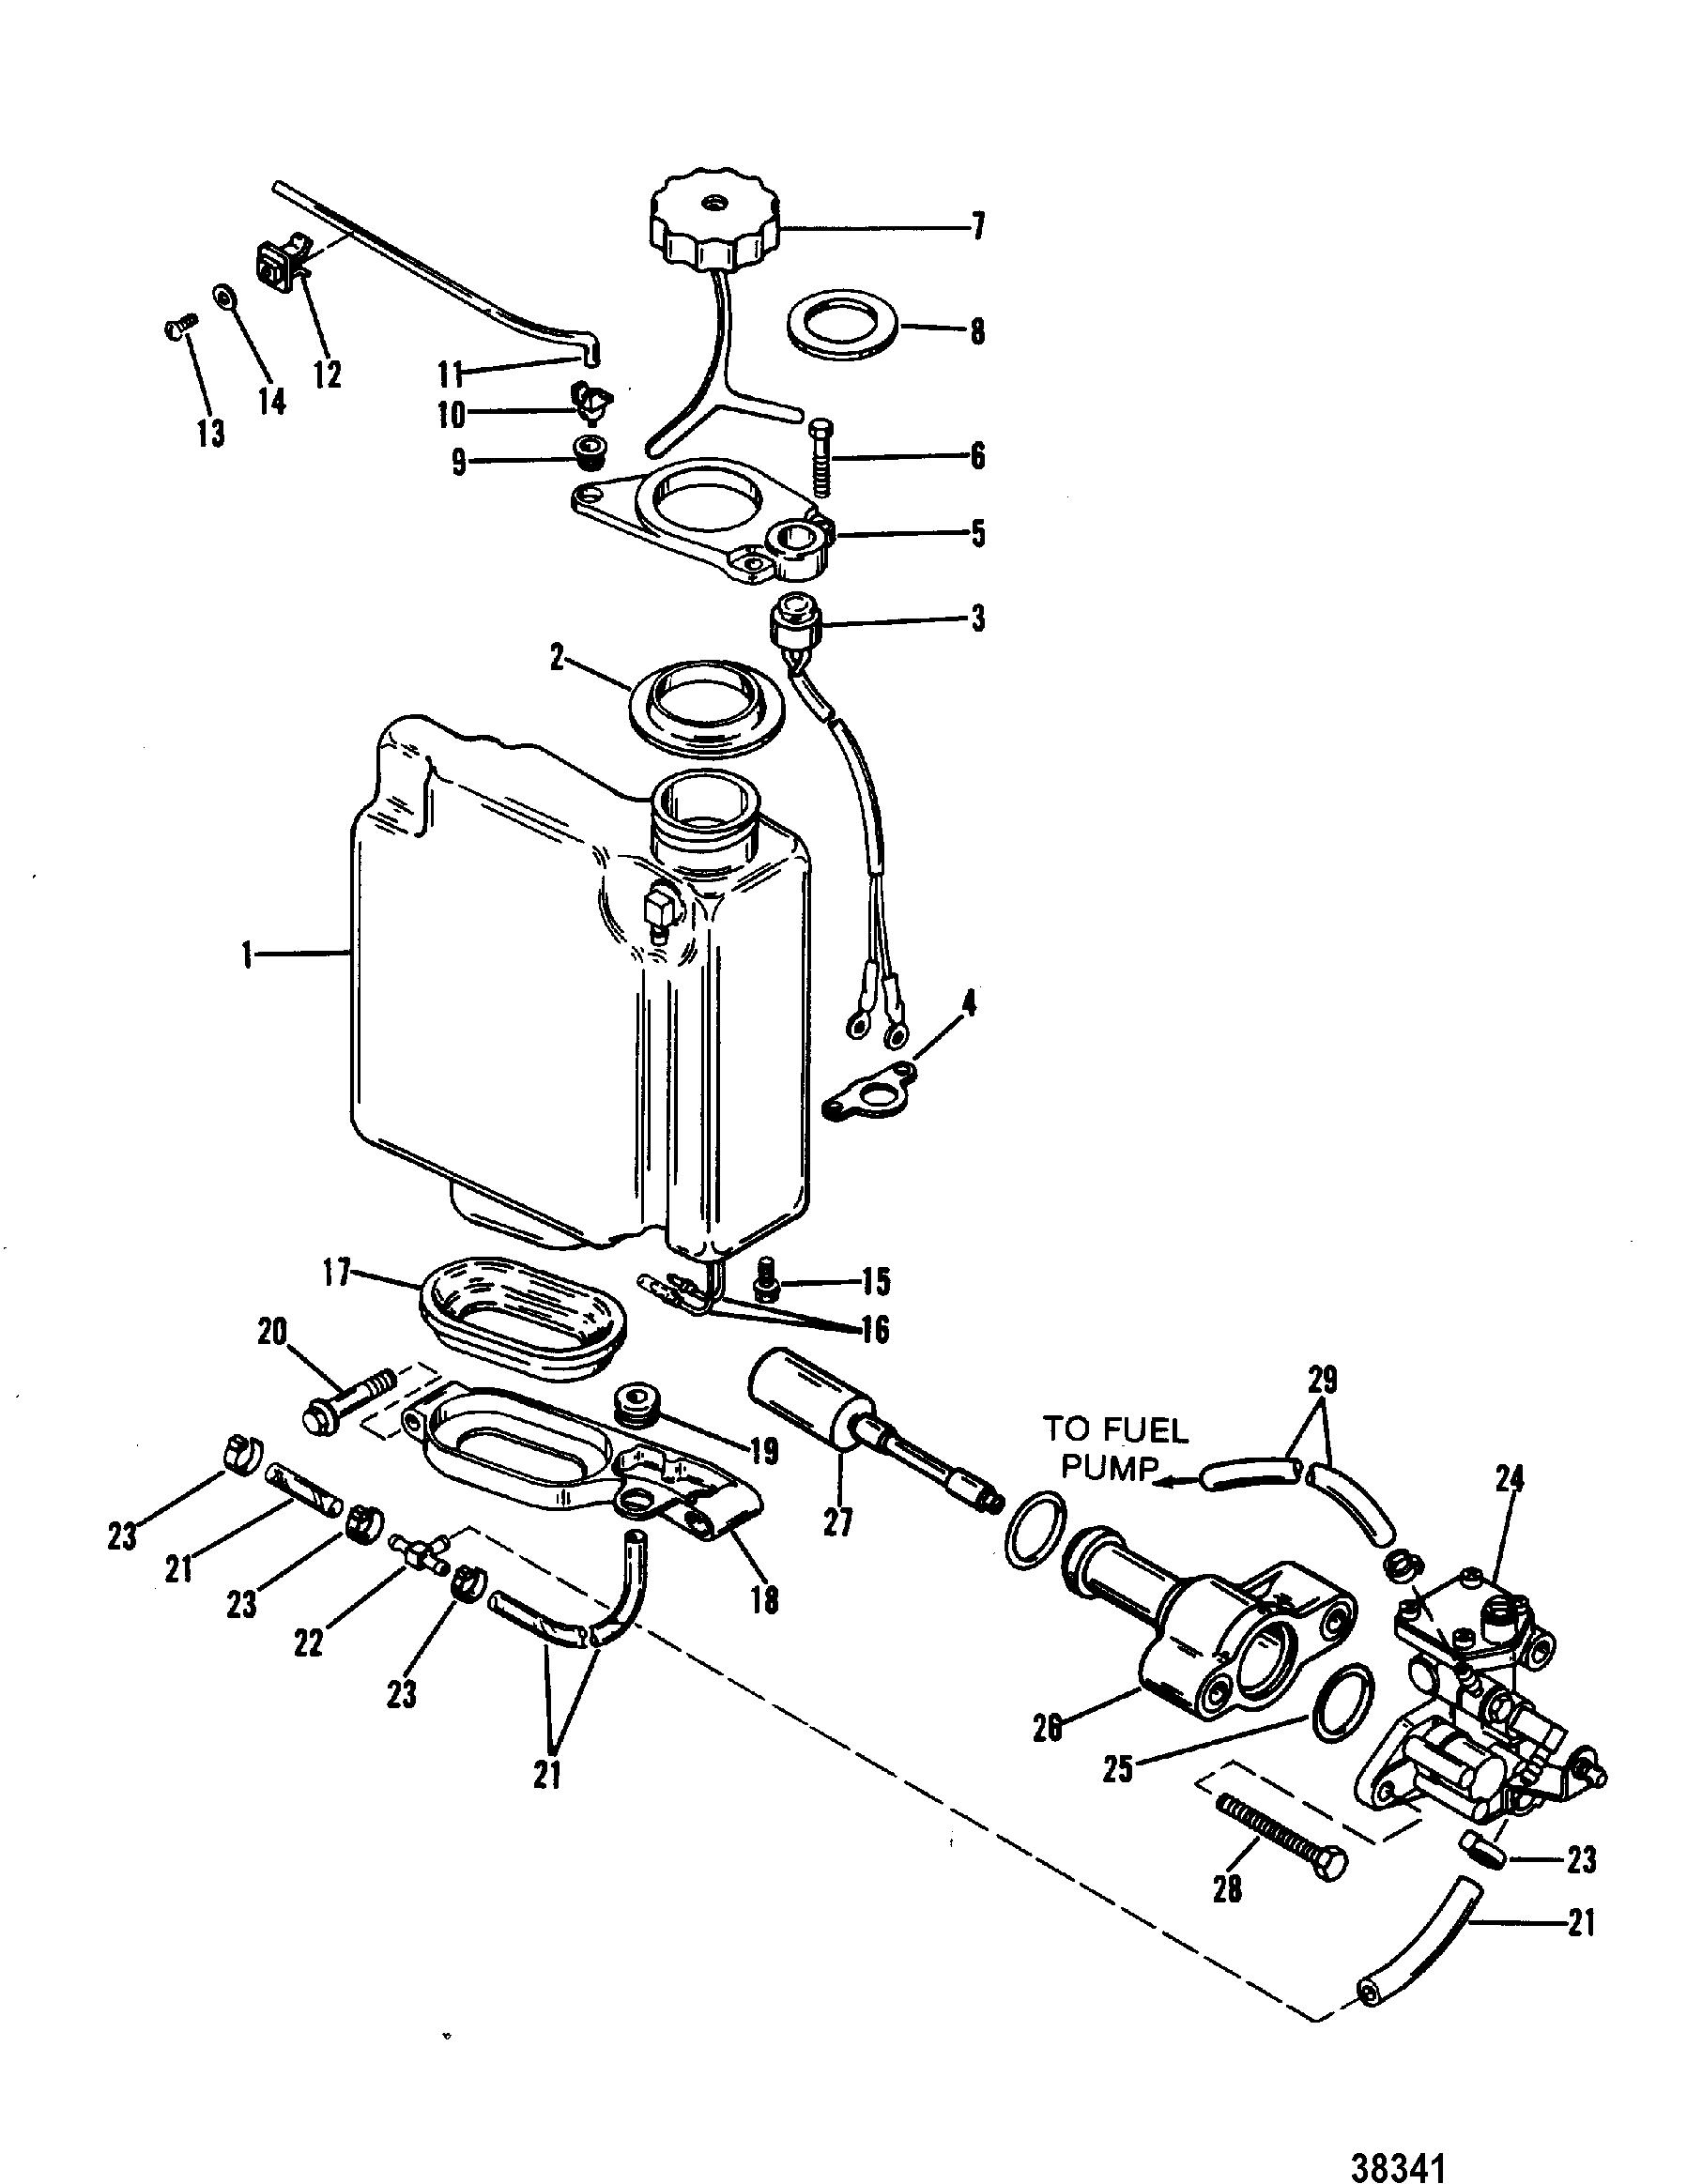 DG_8556] 80 Hp Mercury Oil Injection Wiring Diagram Free DiagramAtolo Elinu Dimet Seve Mohammedshrine Librar Wiring 101